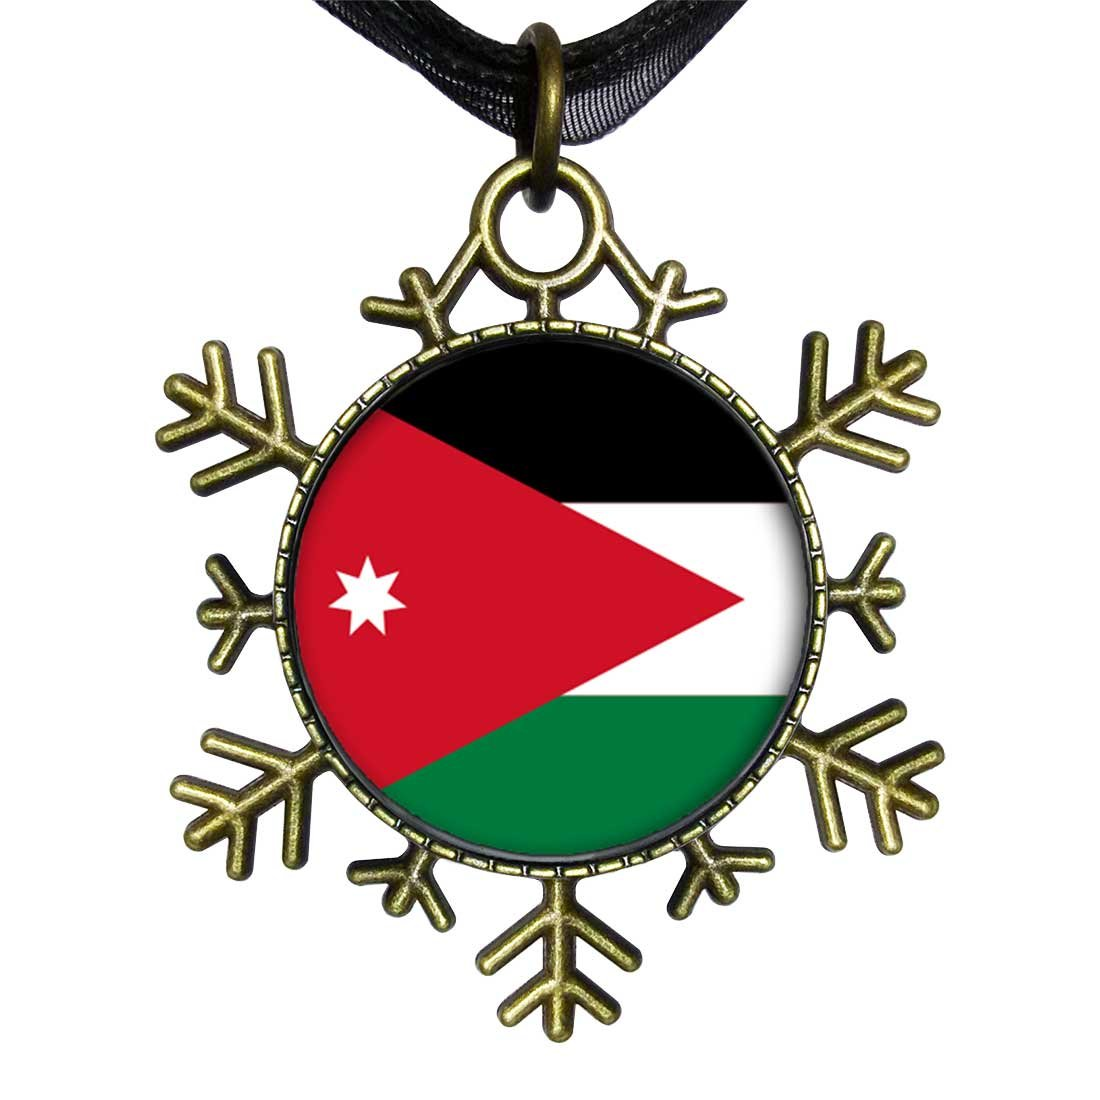 GiftJewelryShop Bronze Retro Style Jordan flag Snowflake Charm Pendant Necklace